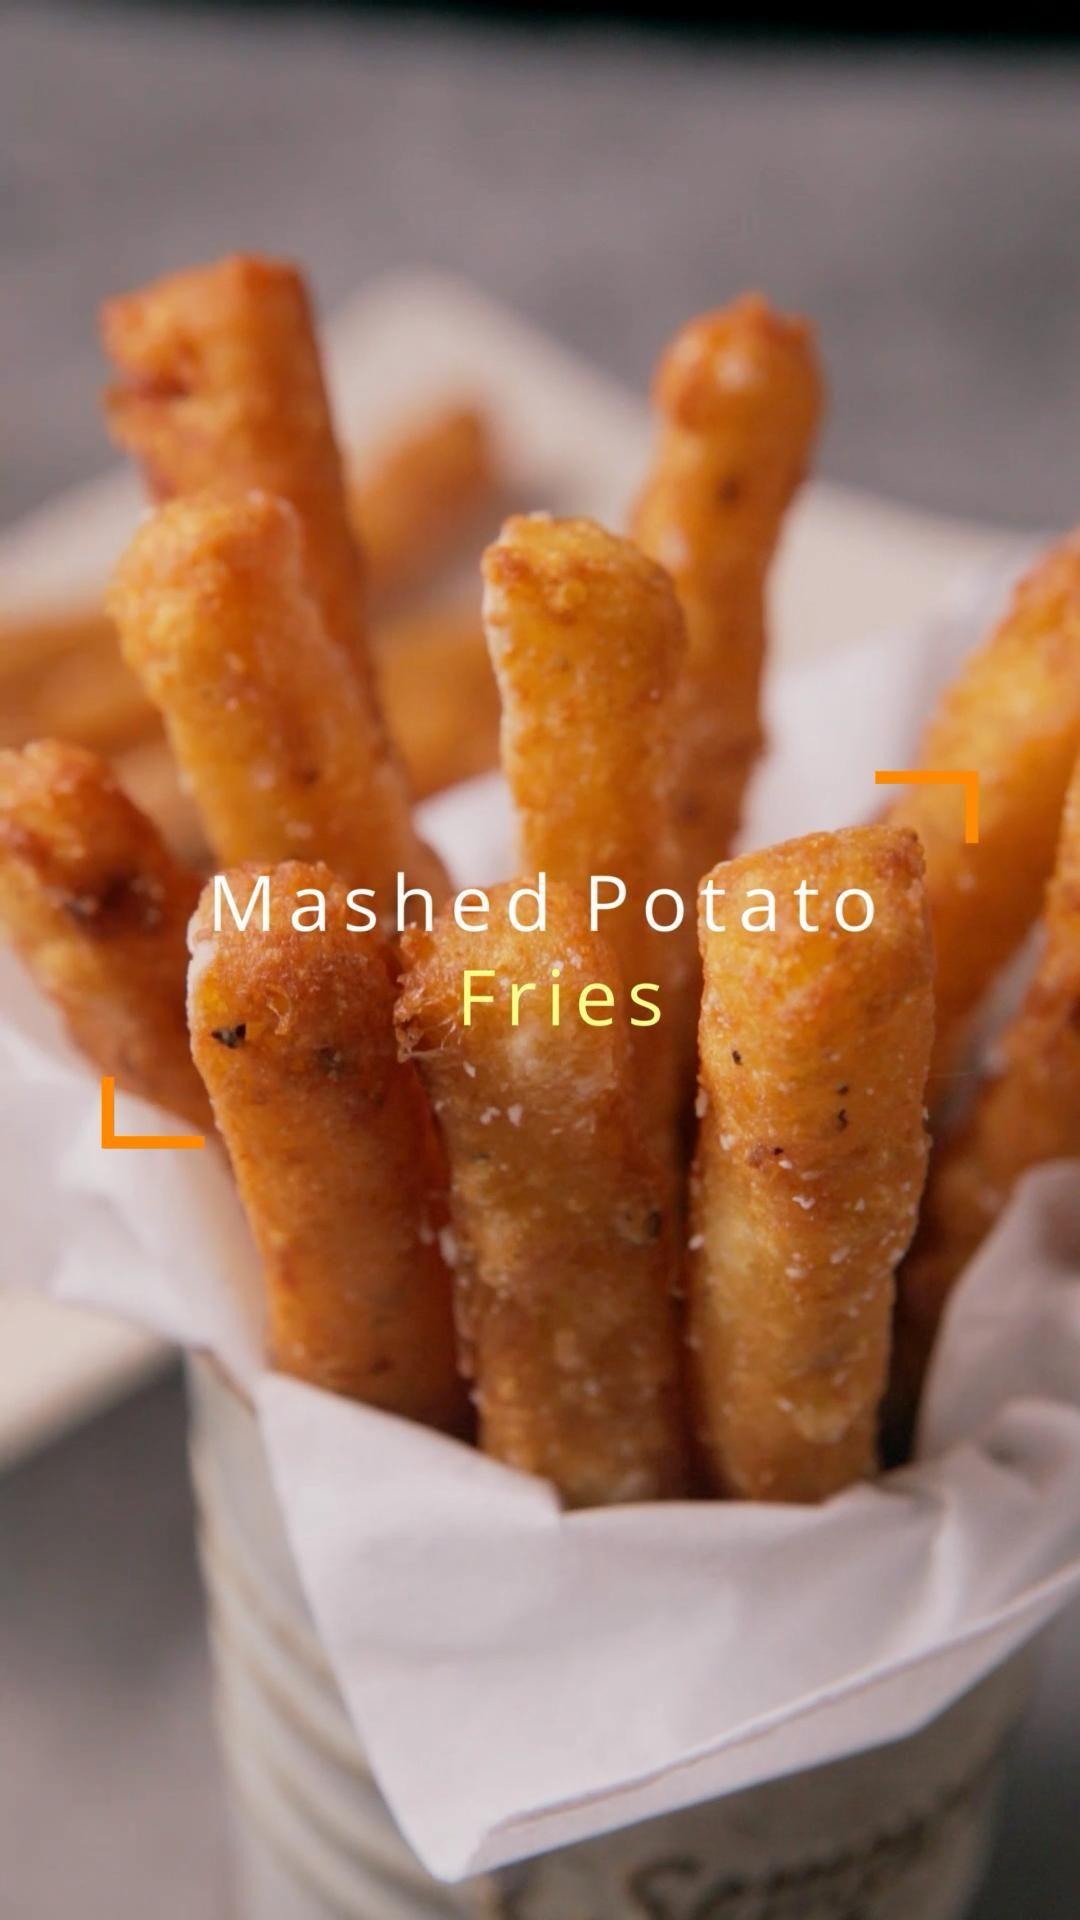 Long Mashed Potato Fries